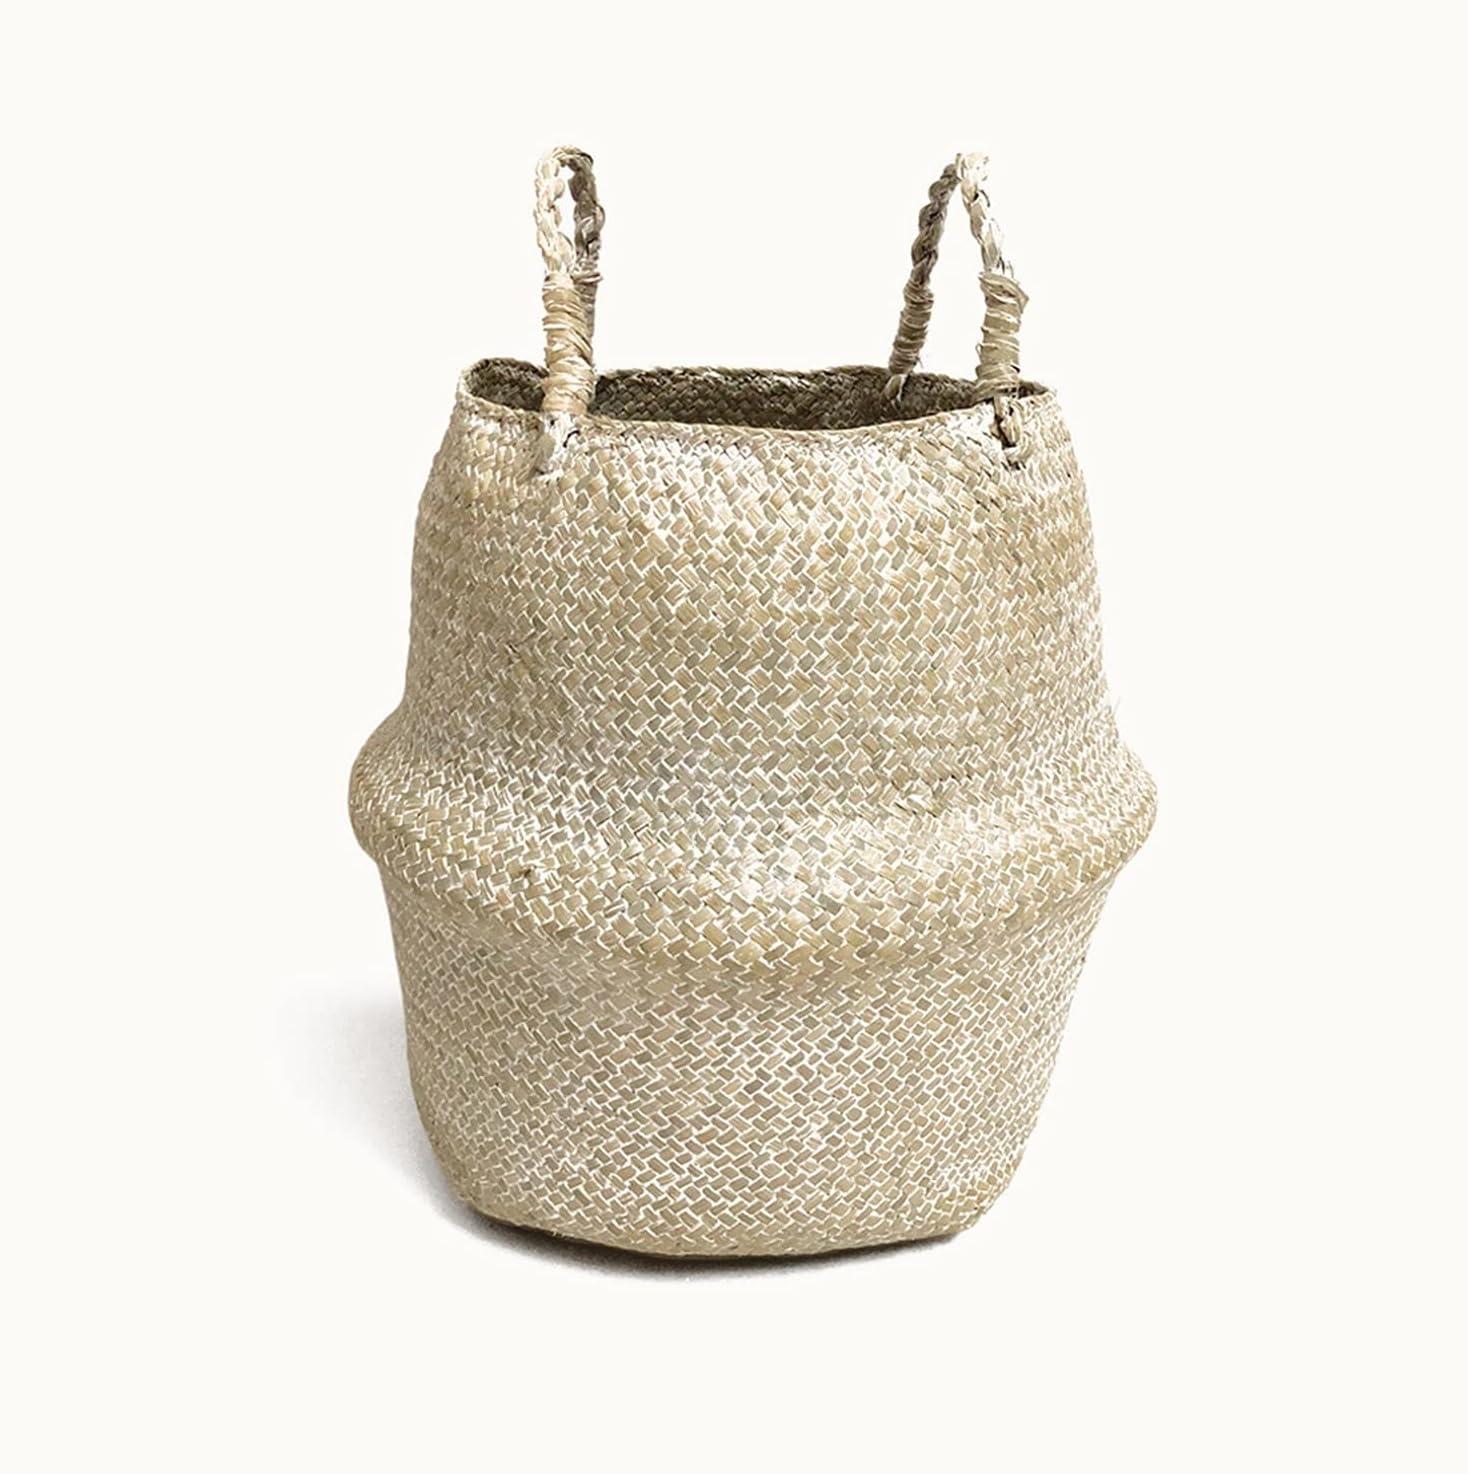 DMYONGLIAN Storage Washington Mall Basket Hand Seaweed Made 2021 model Flower